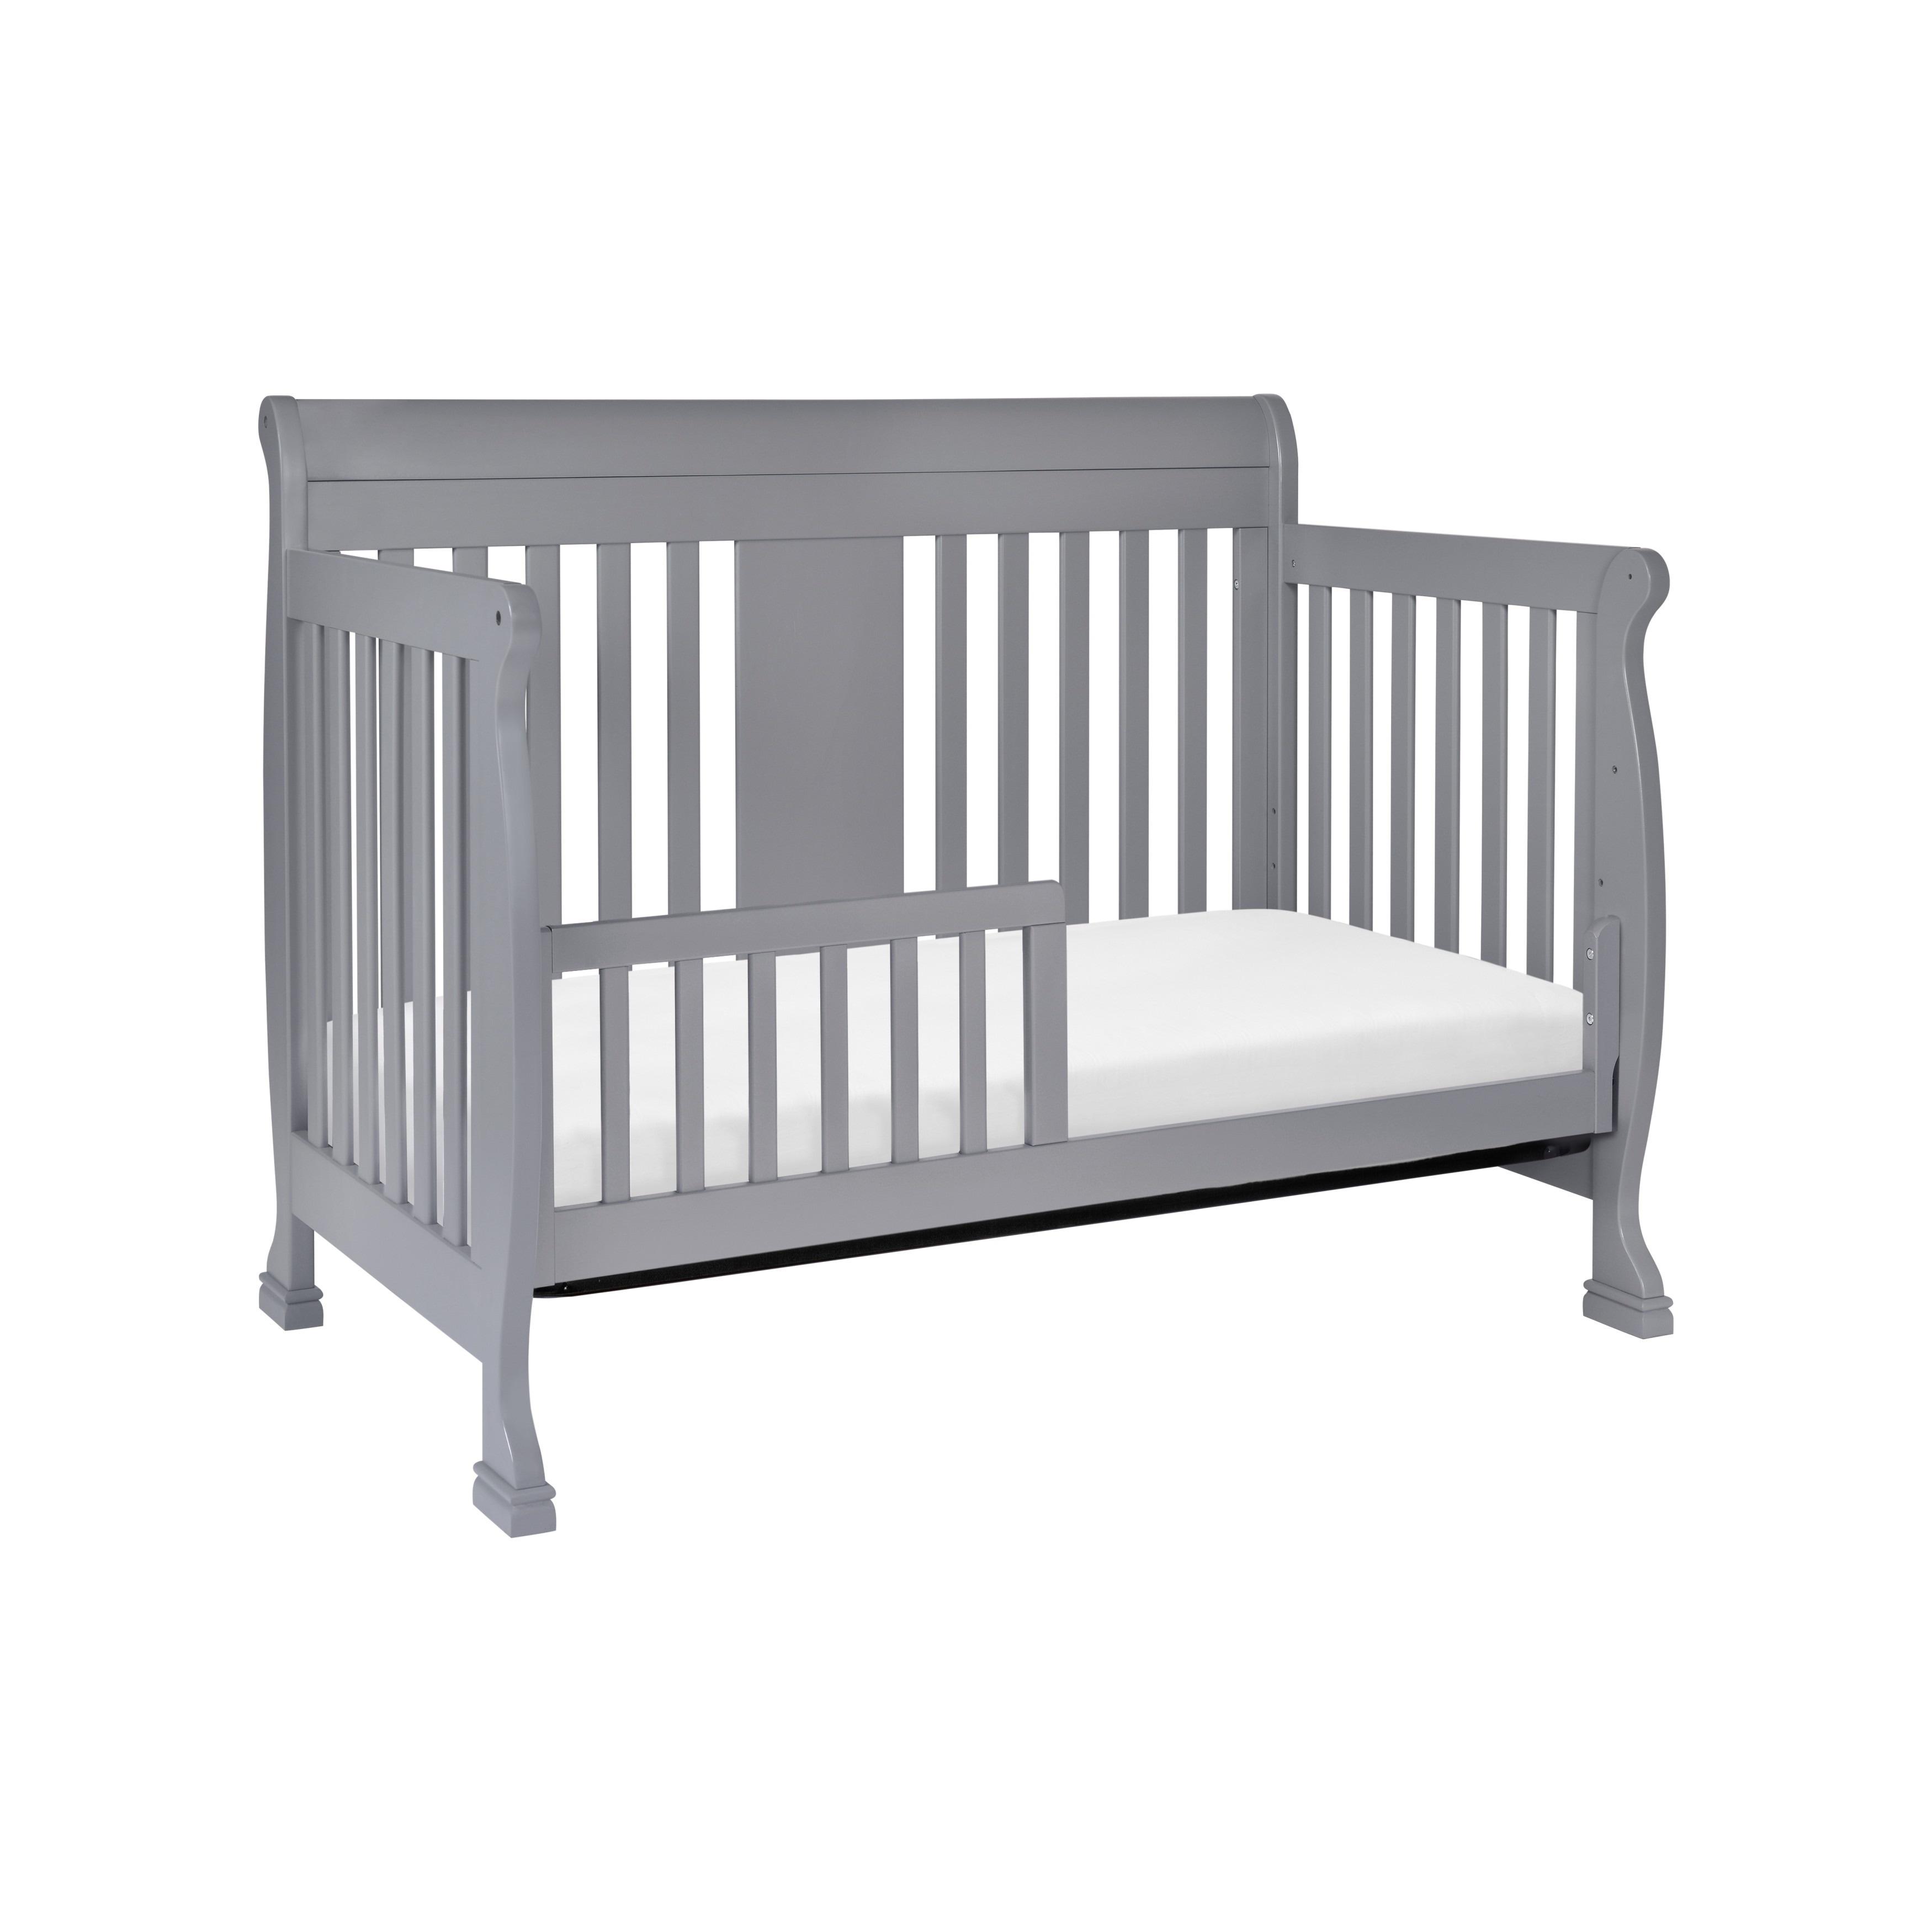 h convertible collection baby nursery davinci in kalani crib room emily